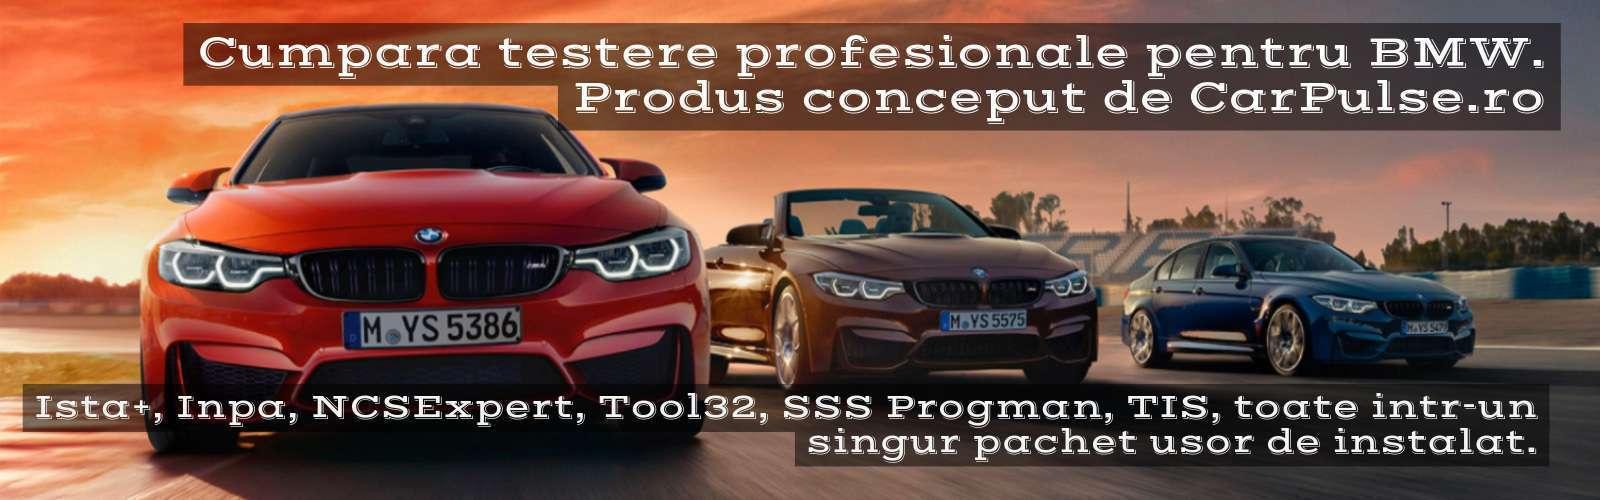 diagnoza profesionala BMW - inpa ista tool32 ncsexpert